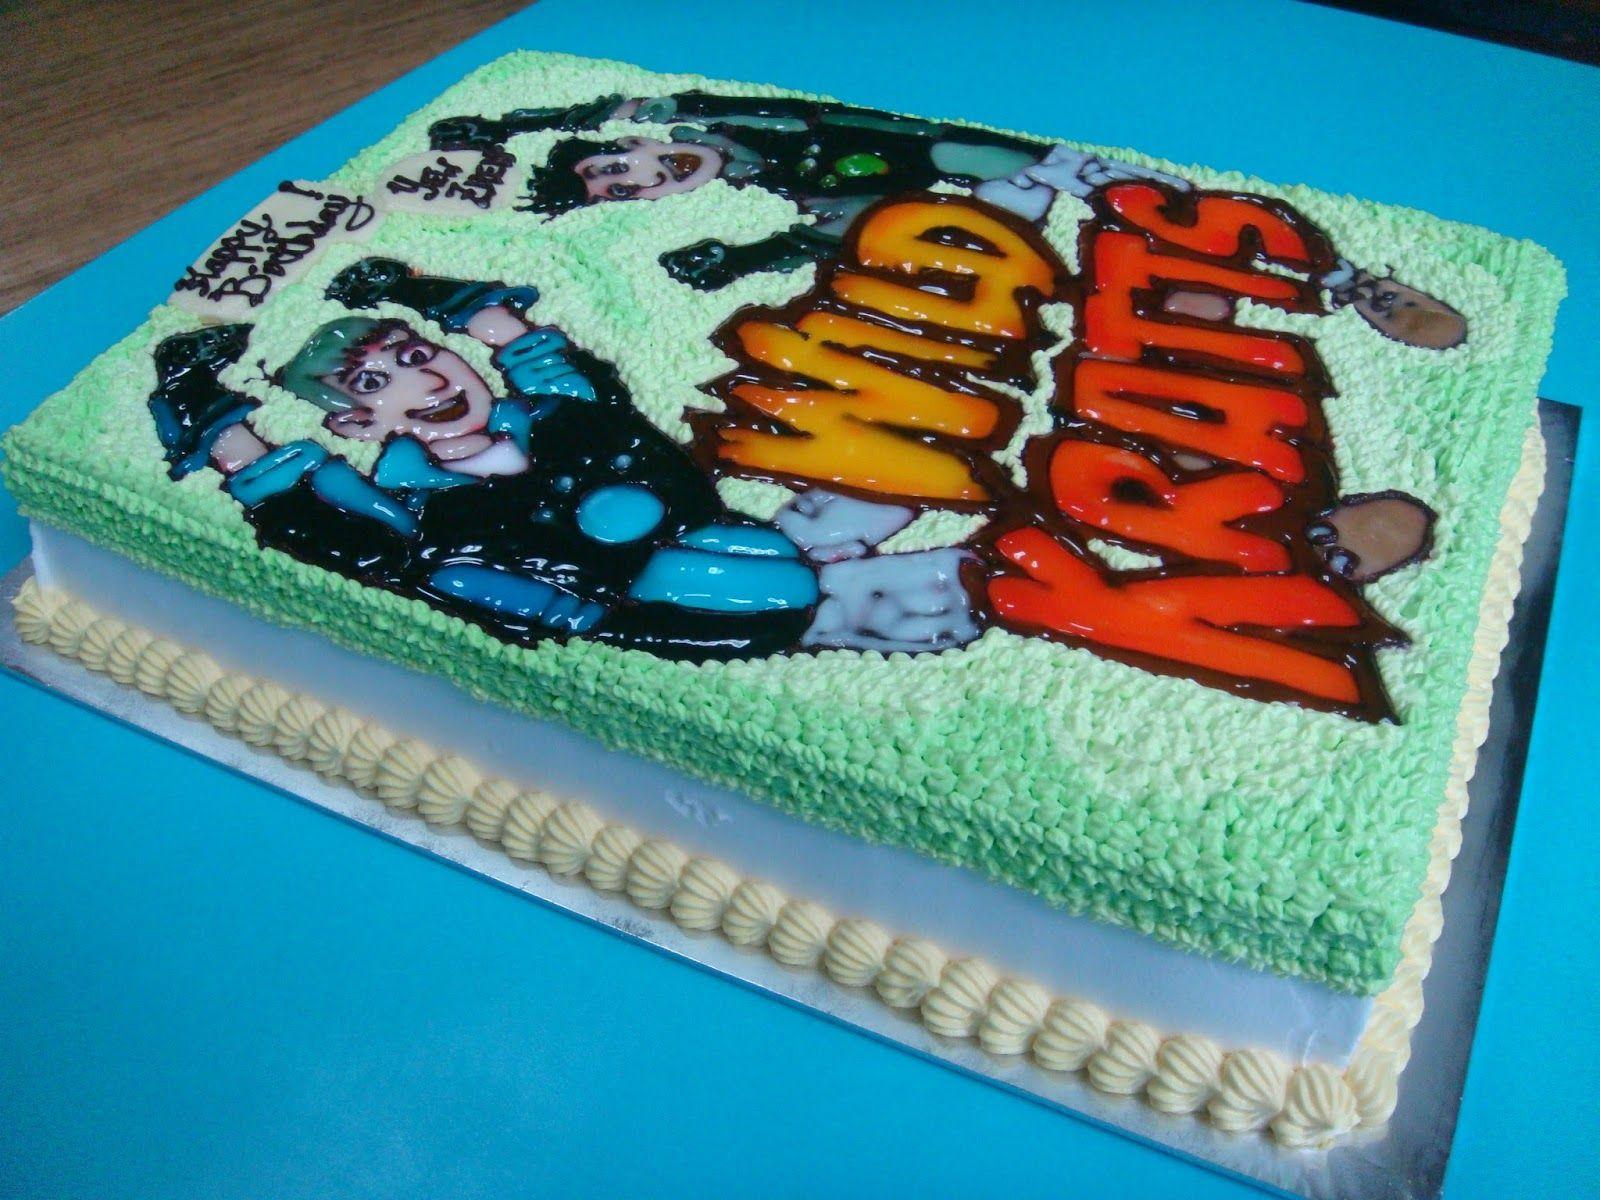 Wild Kratts Cake Topper cakepins.com | Wild kratts ...